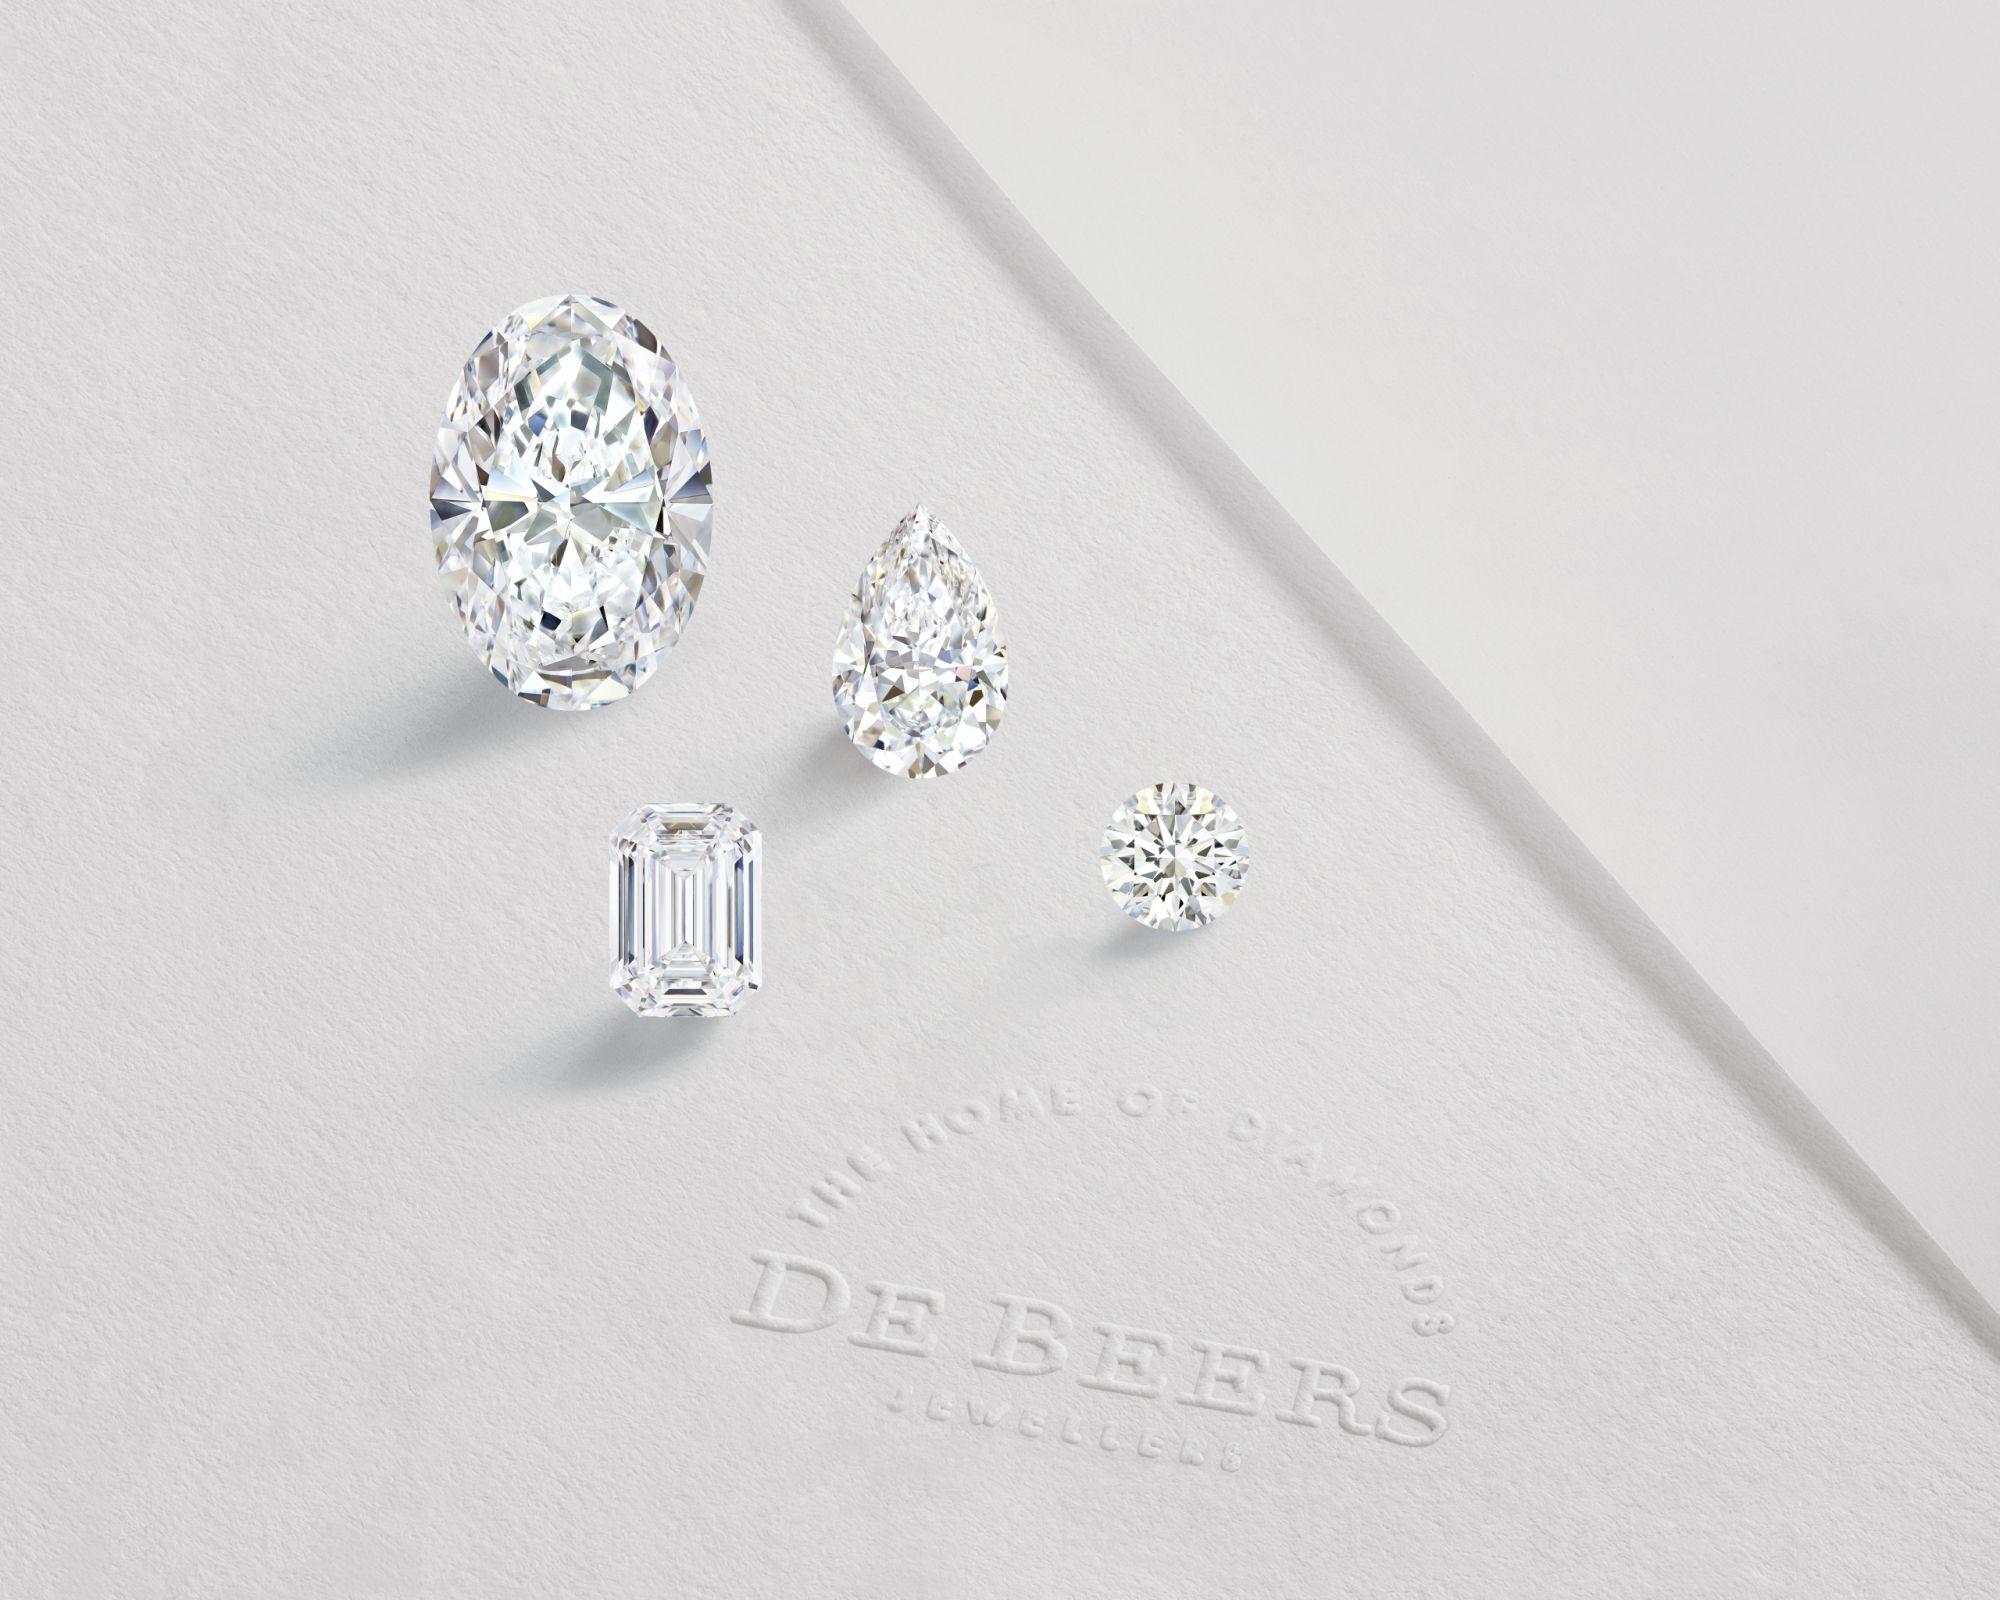 1888 Master Diamonds 2020